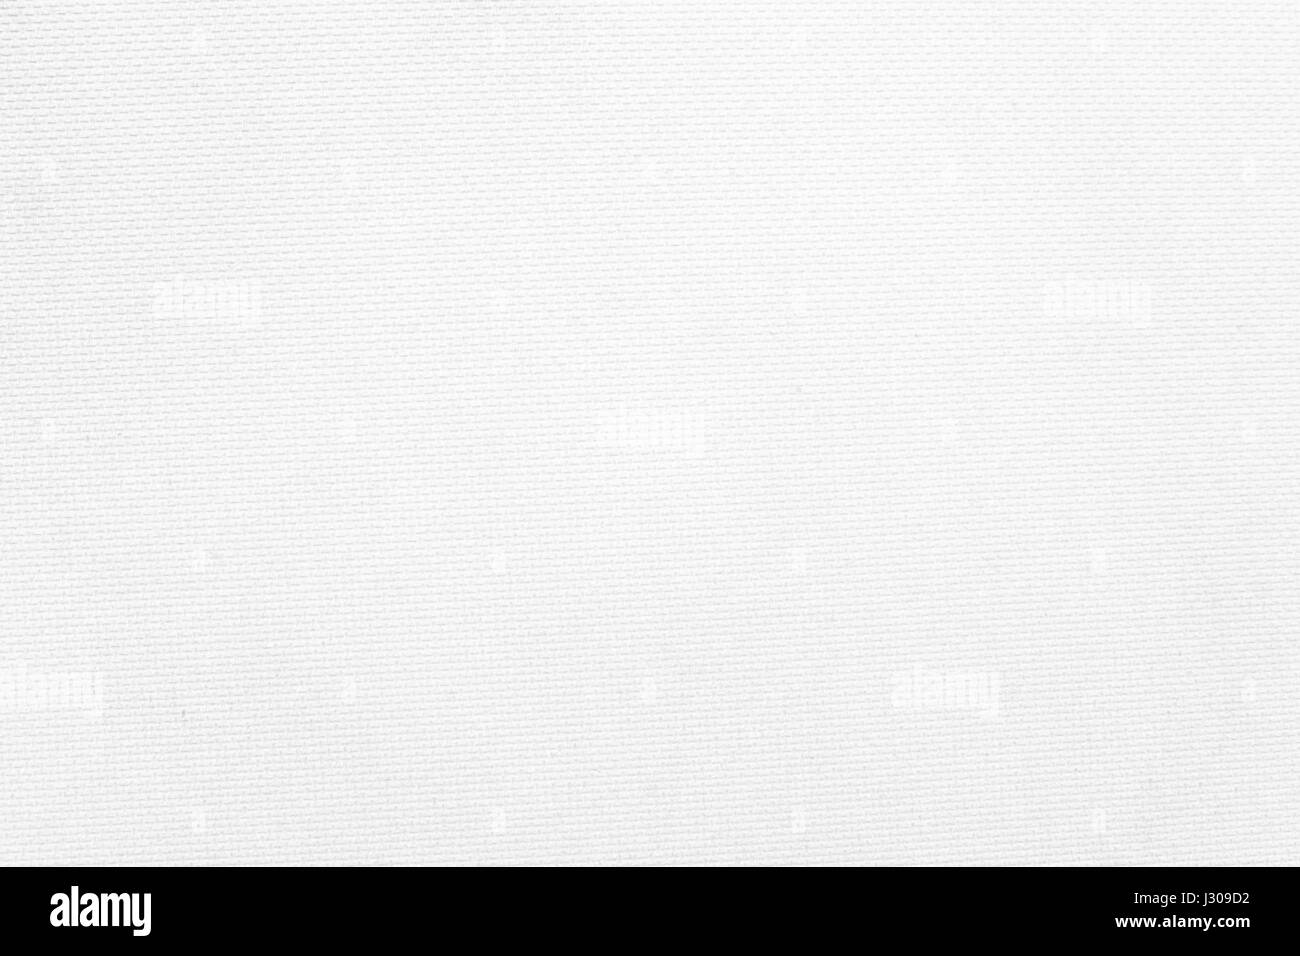 White Plywood Texture Background. - Stock Image